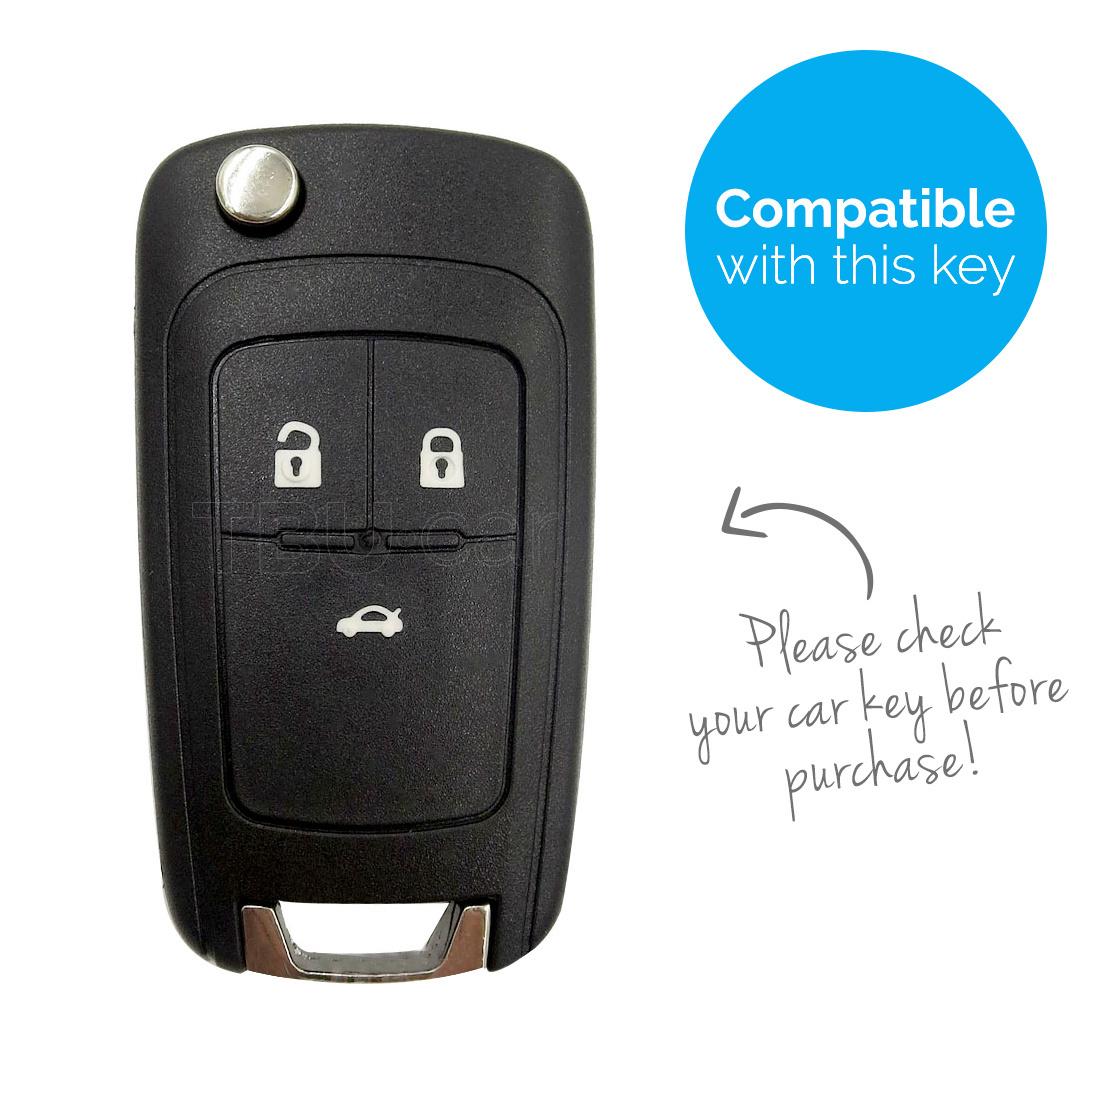 TBU car TBU car Autoschlüssel Hülle kompatibel mit Chevrolet 3 Tasten - Schutzhülle aus Silikon - Auto Schlüsselhülle Cover in Schwarz